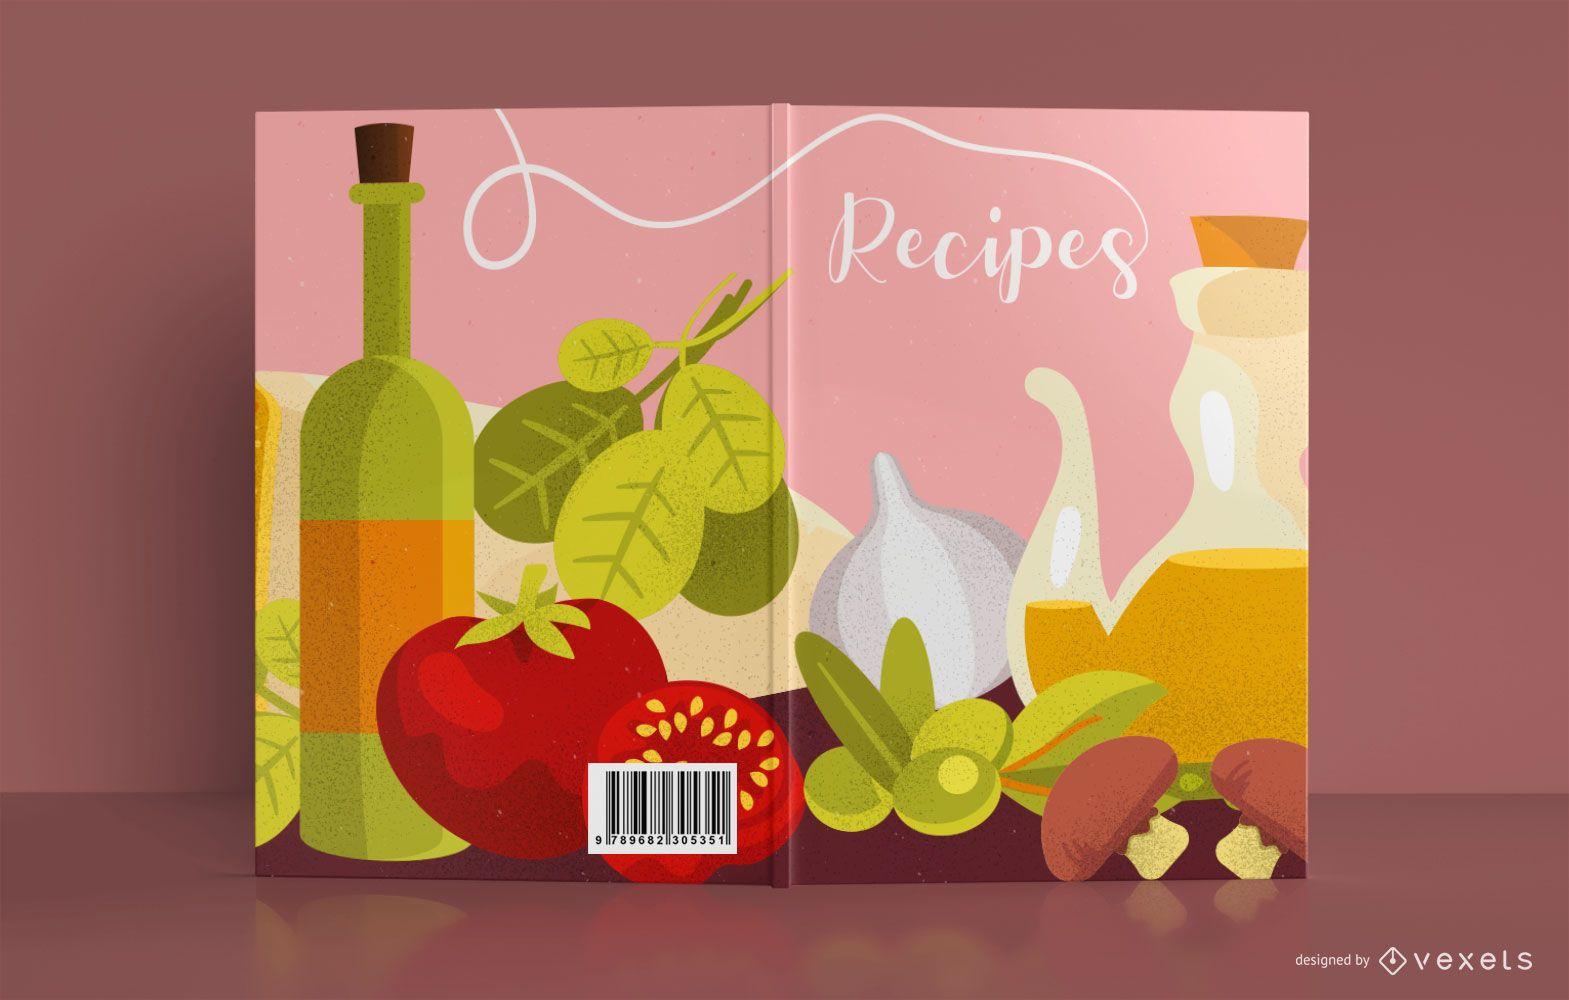 Recipe Food Illustration Book Cover Design